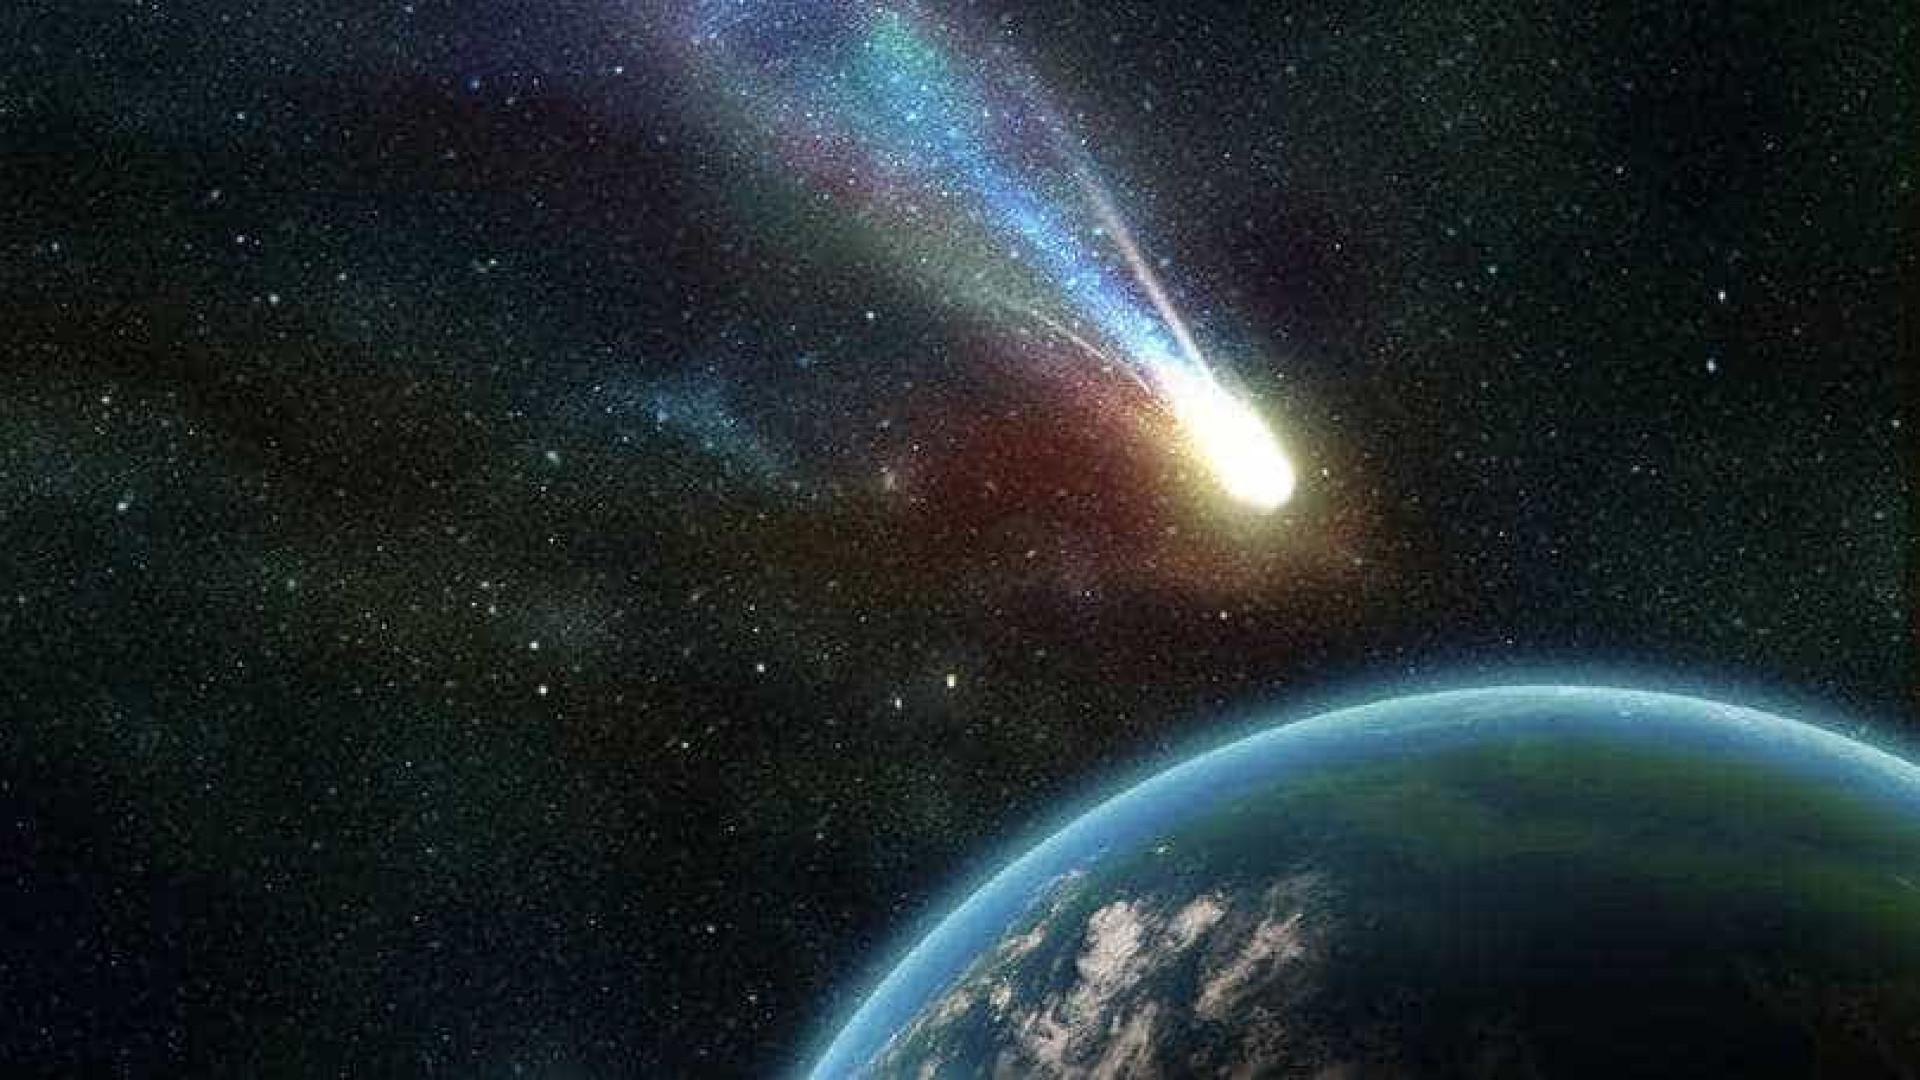 Cometa passará perto da Terra e pintará céu de verde